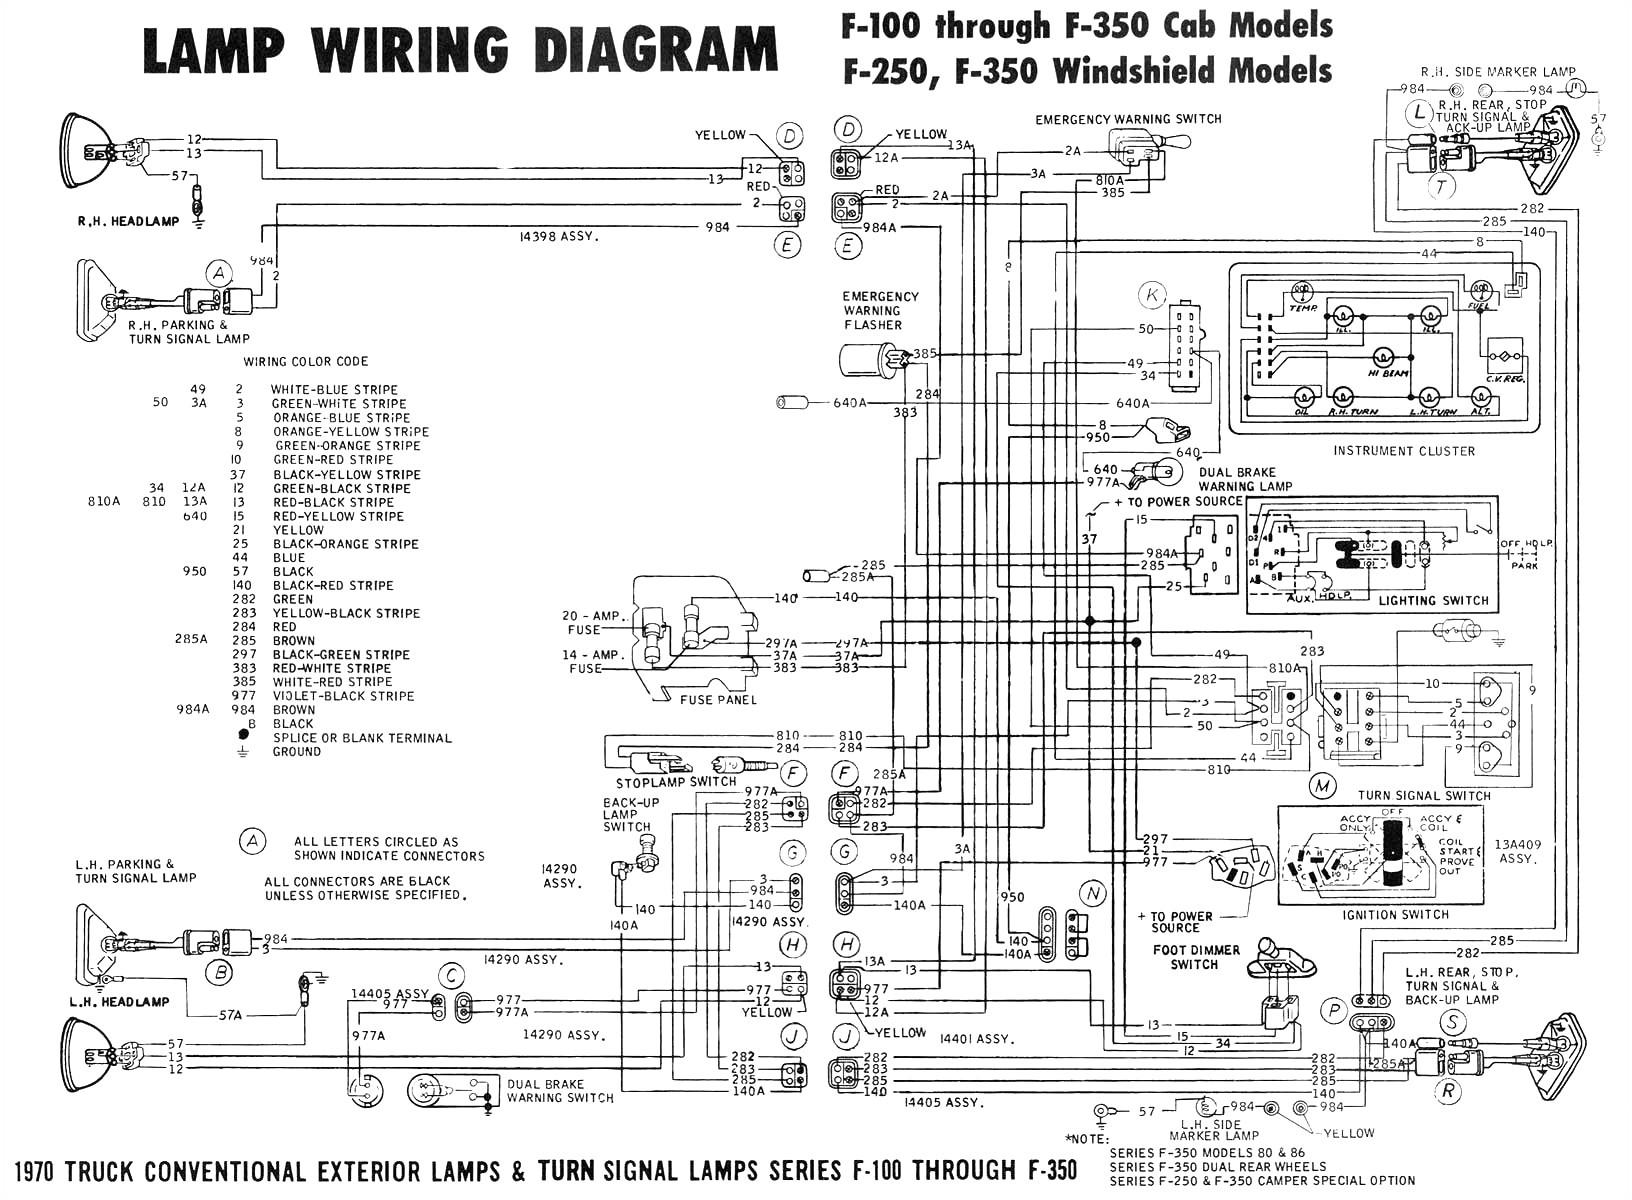 Jvc Kw R500 Wiring Diagram 97 7 3l Wiring Diagram Wiring Diagram Blog